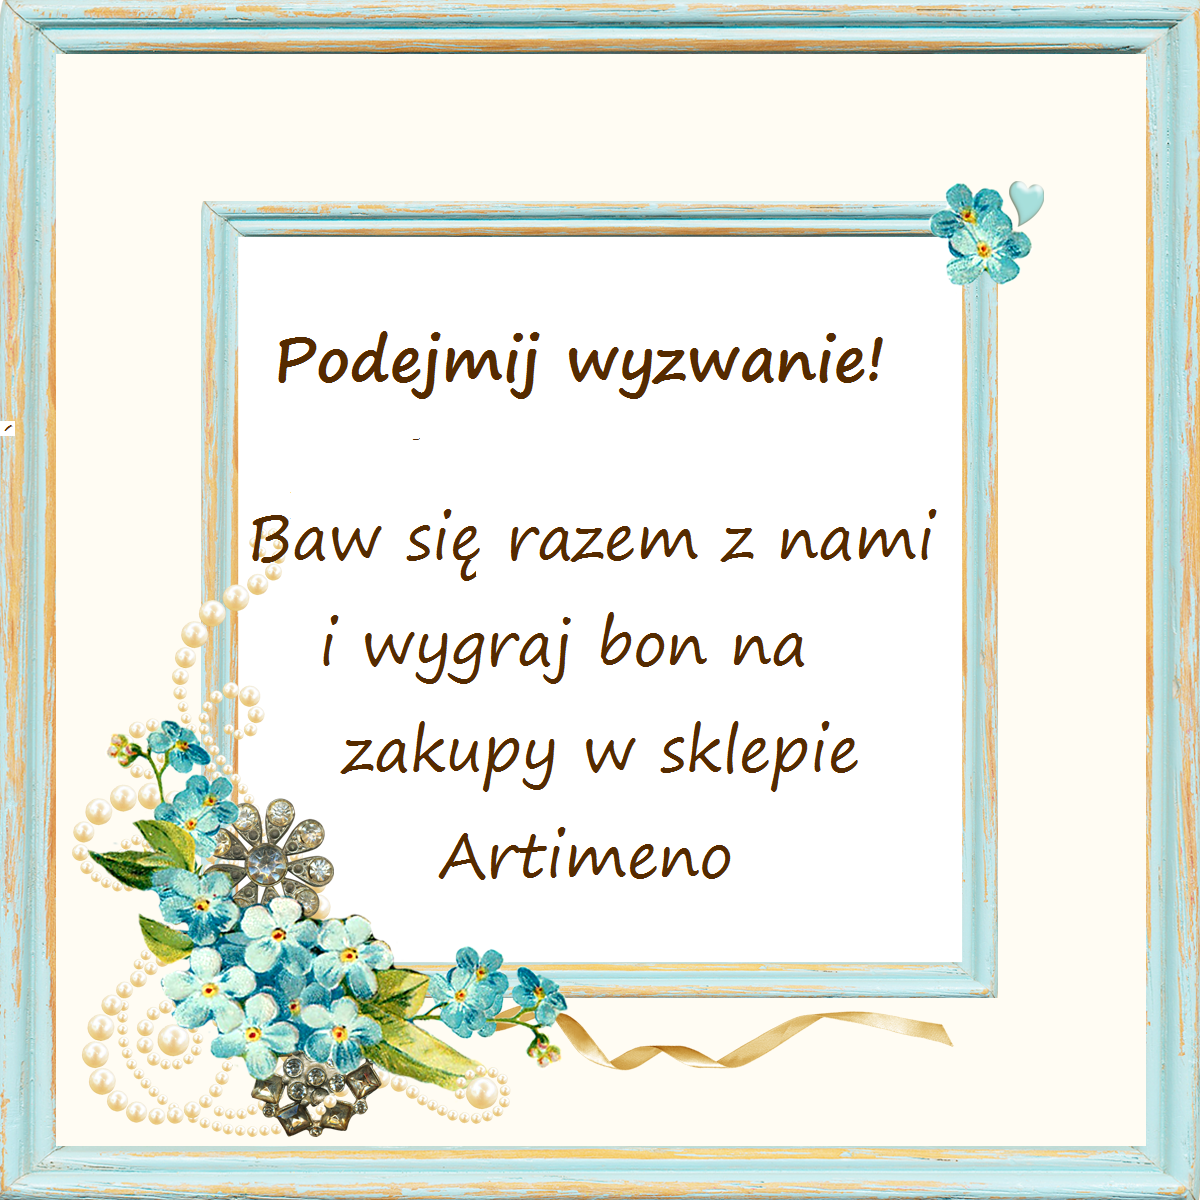 http://artimeno.blogspot.com/2014/05/wyzwanie25.html